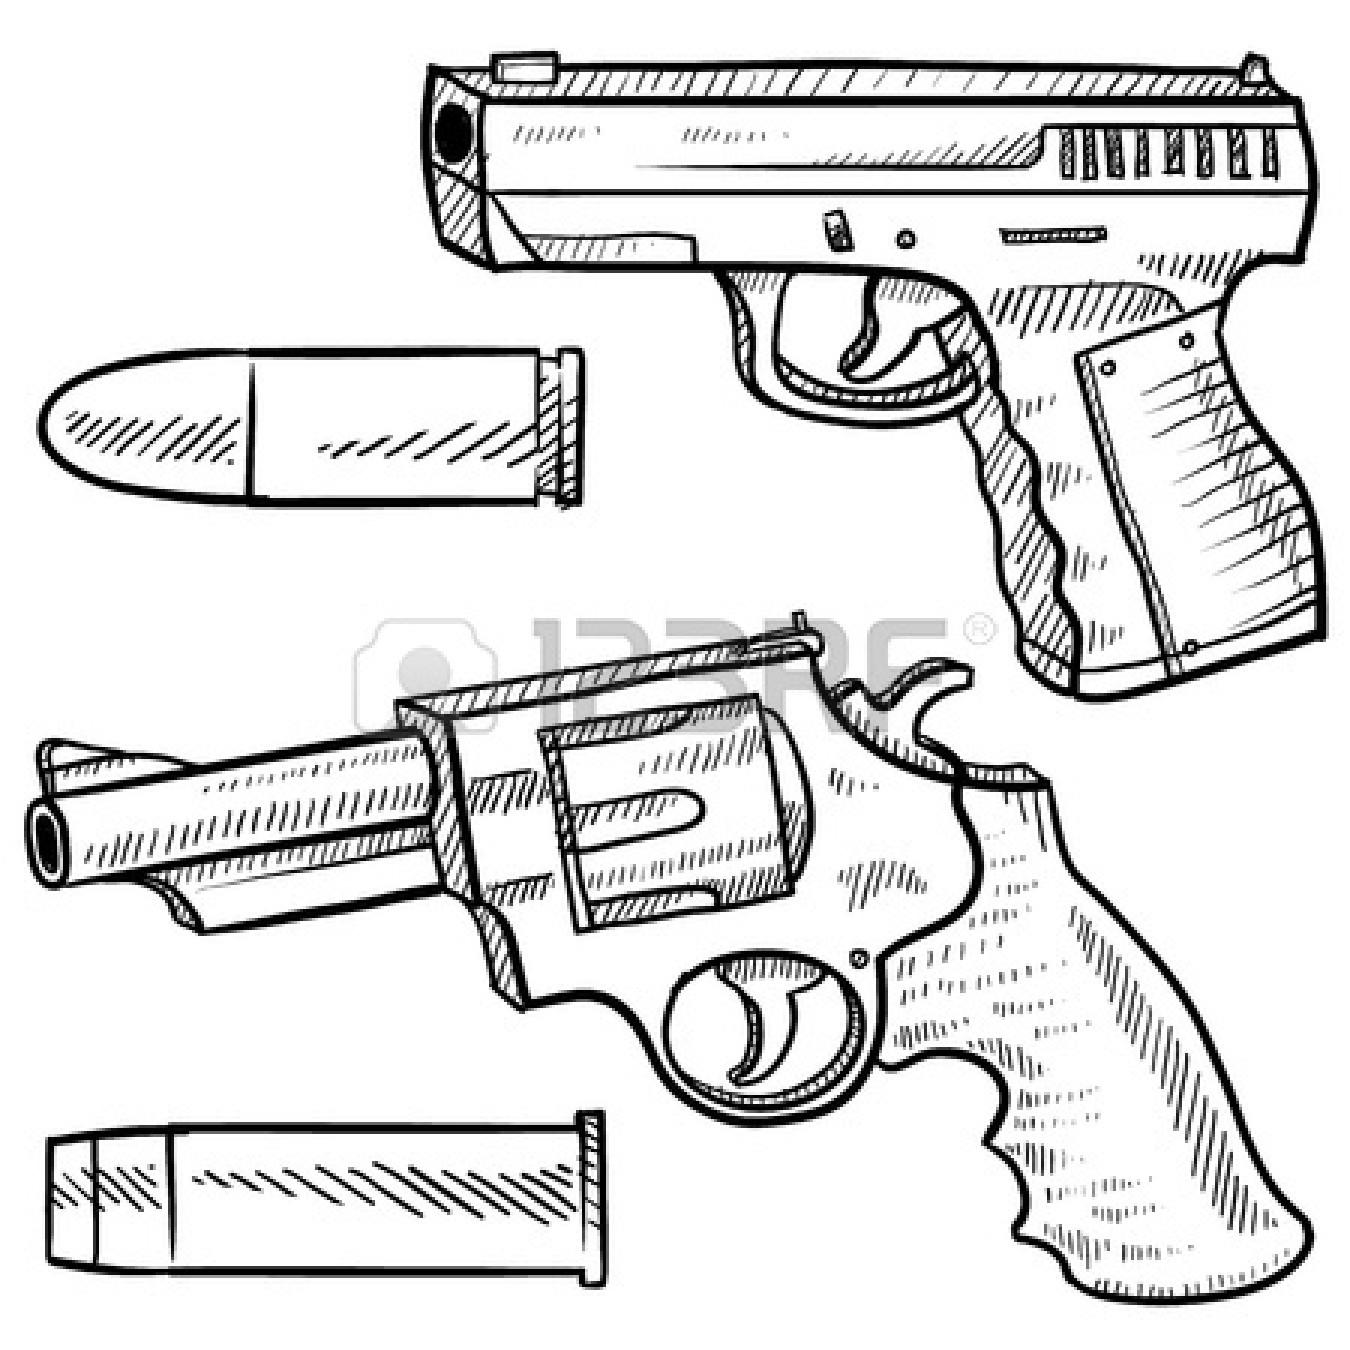 Drawn weapon bullet #bullet #gun tattoos Pinterest #bullet